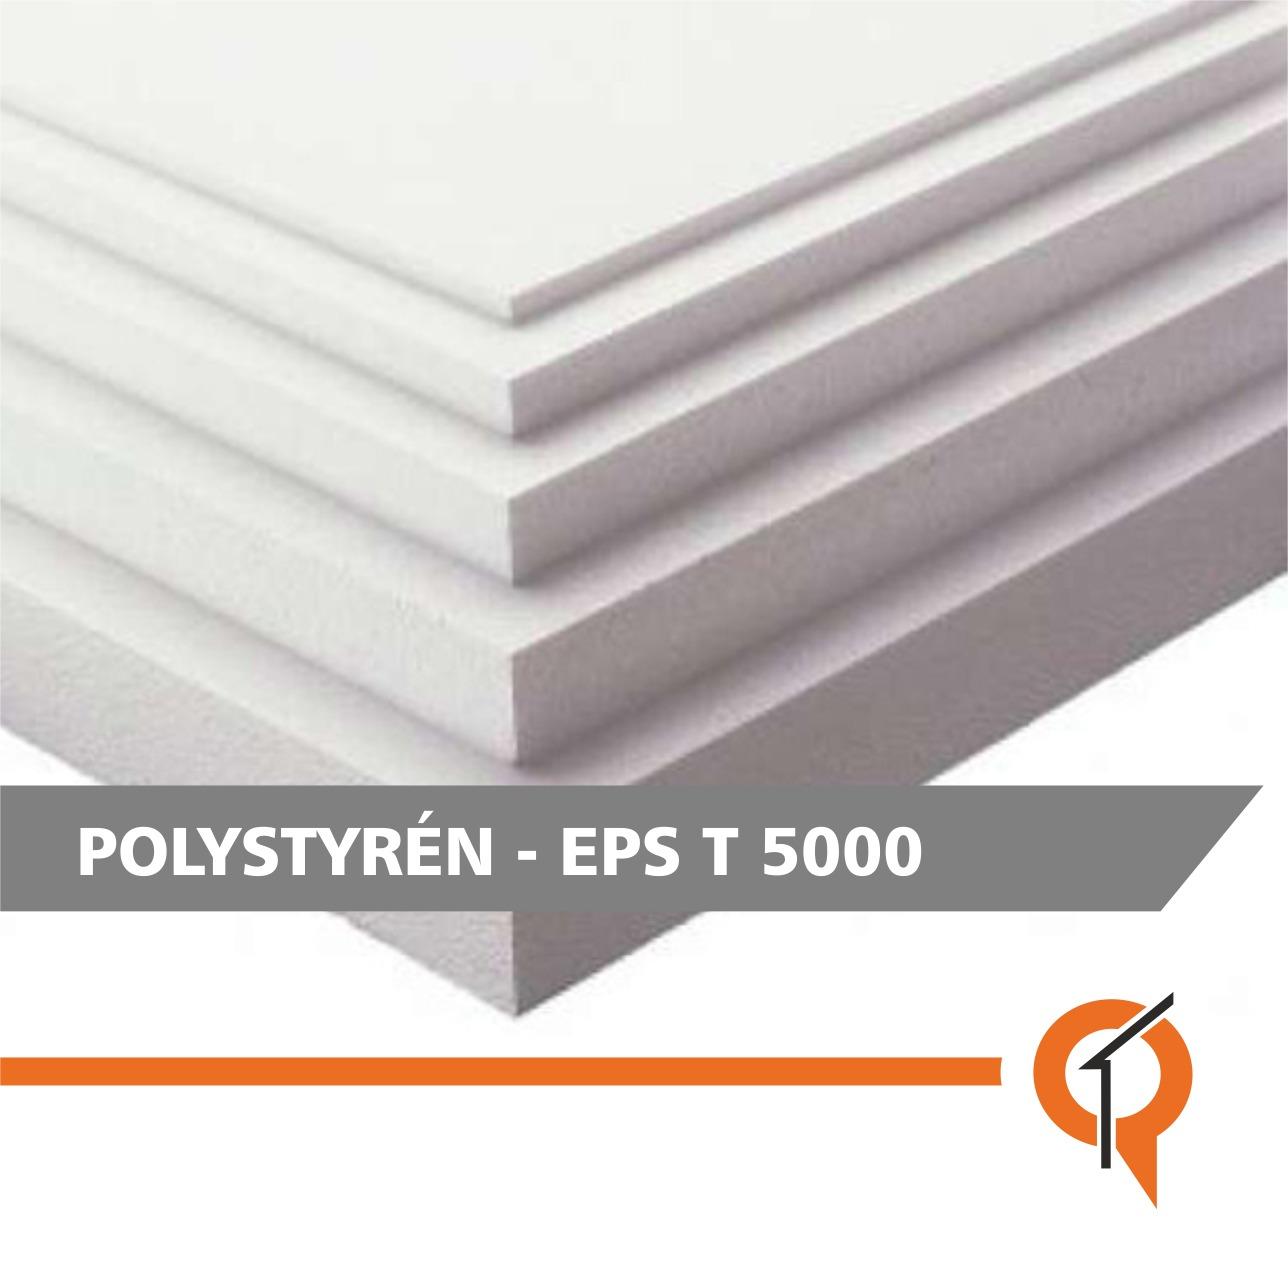 eps_T_5000_polystyren_podlahovy_qtrend